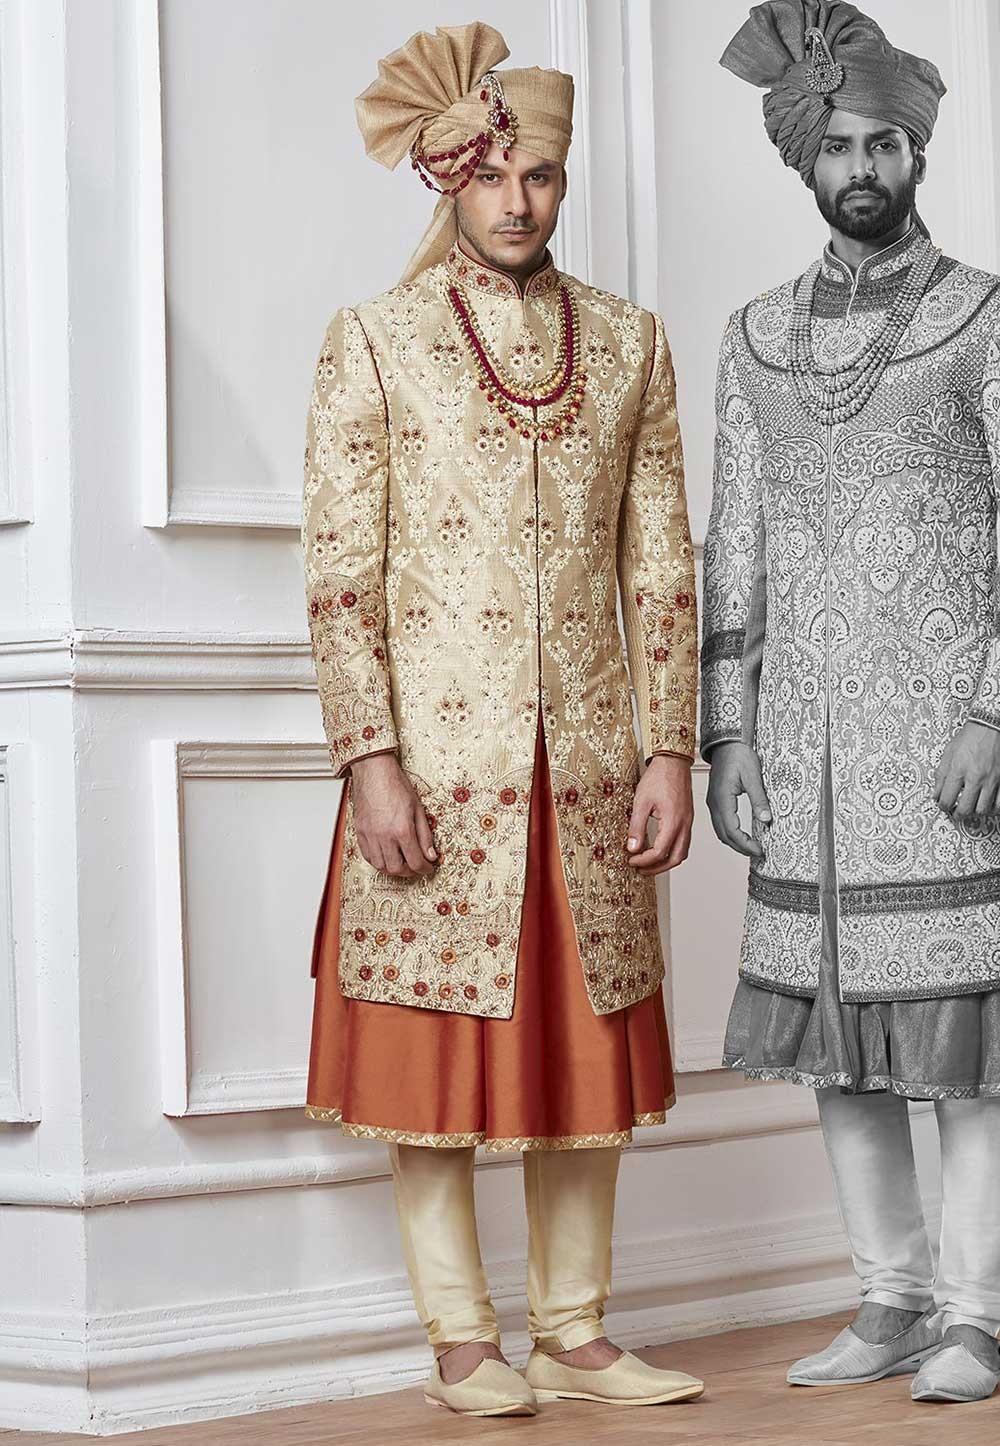 Golden,Cream Color Indian Wedding Sherwani.